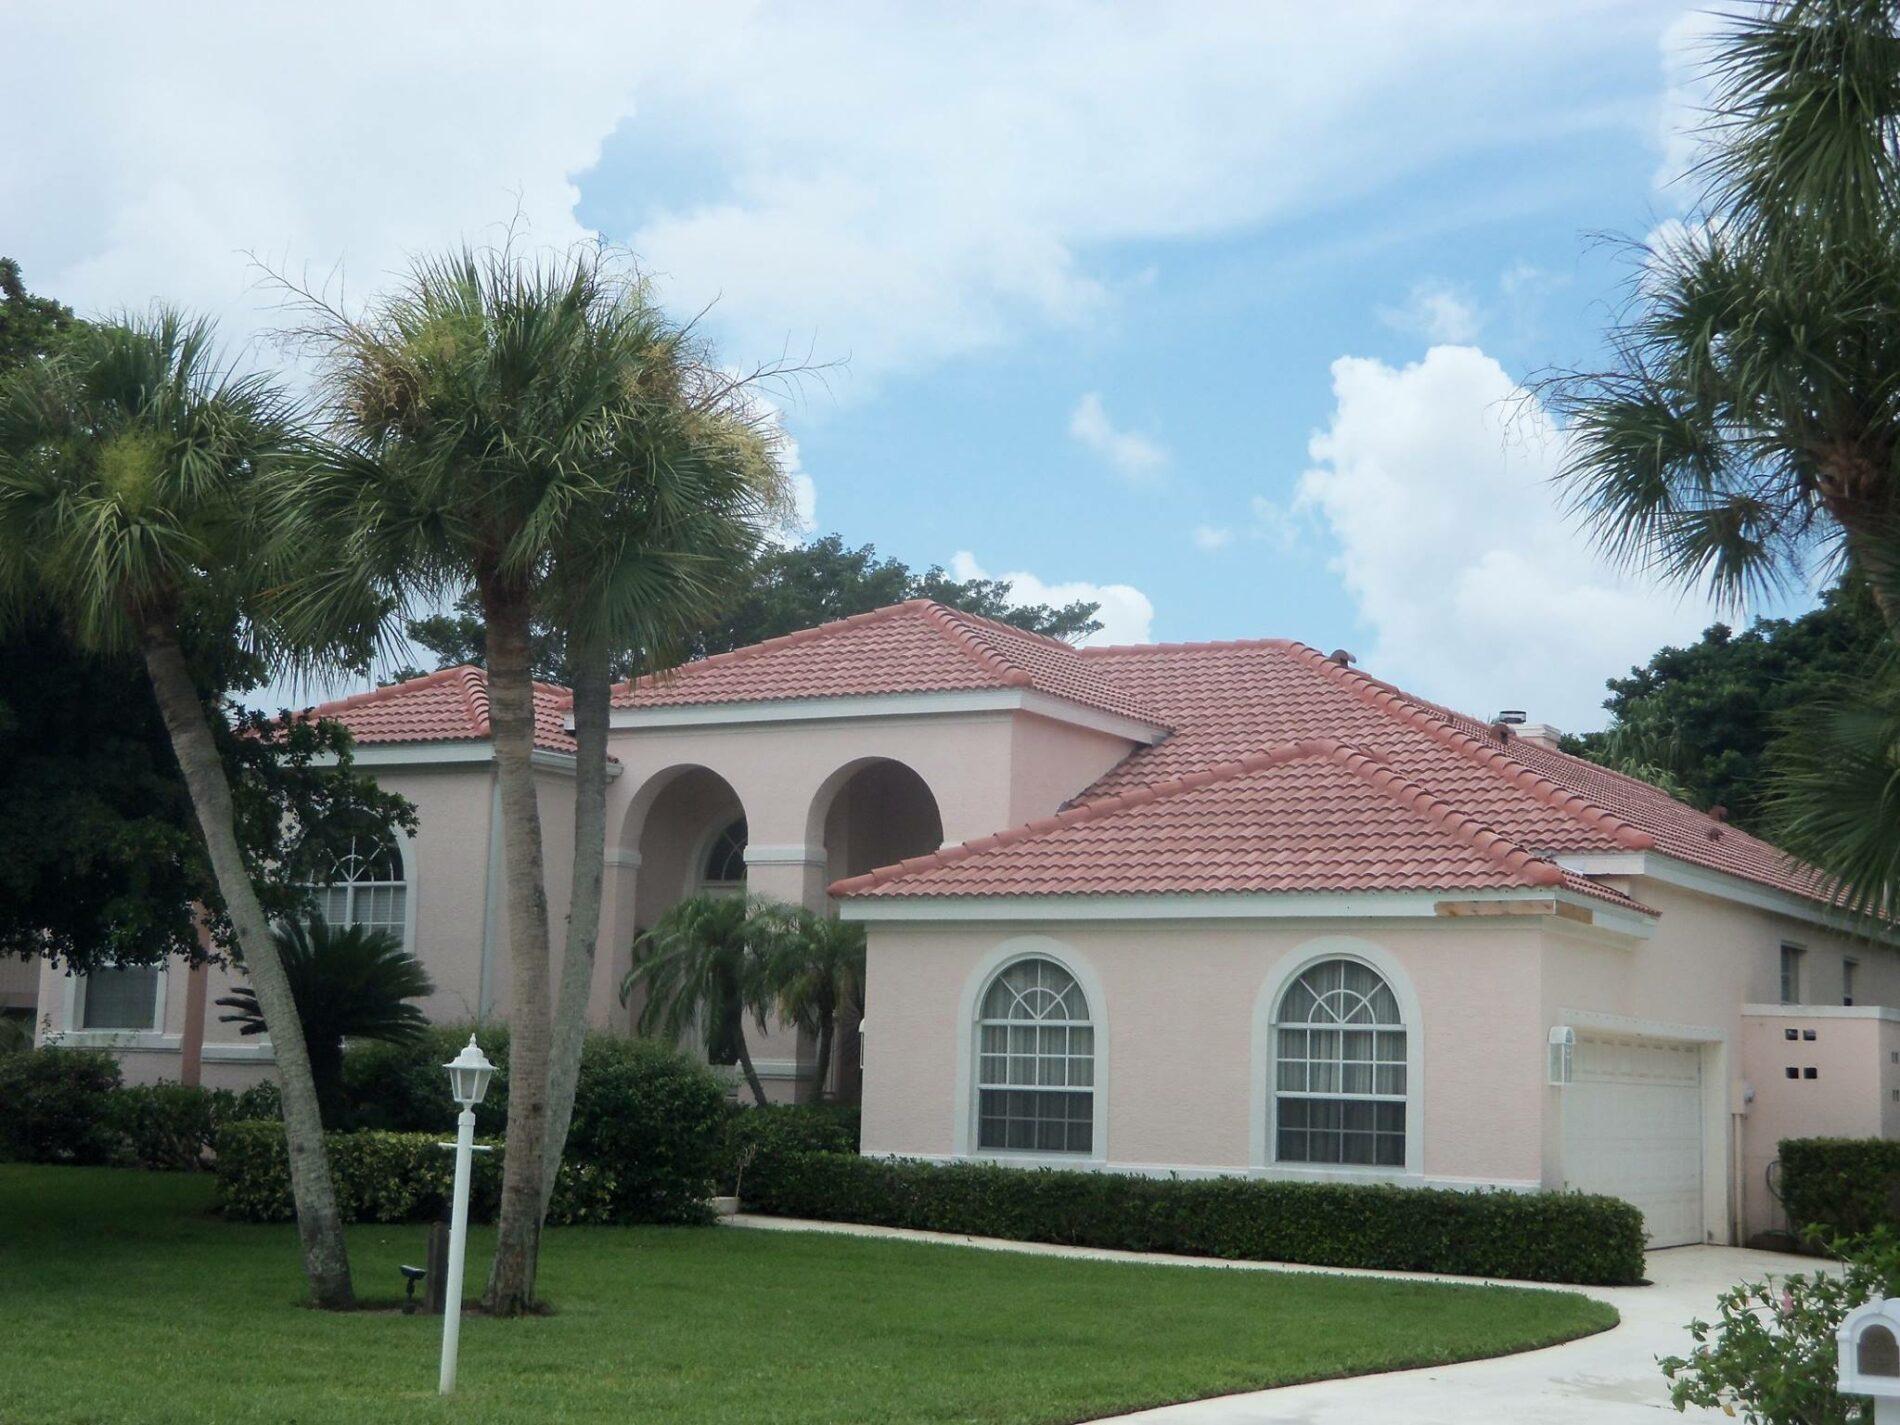 roofing contractors Venice FL